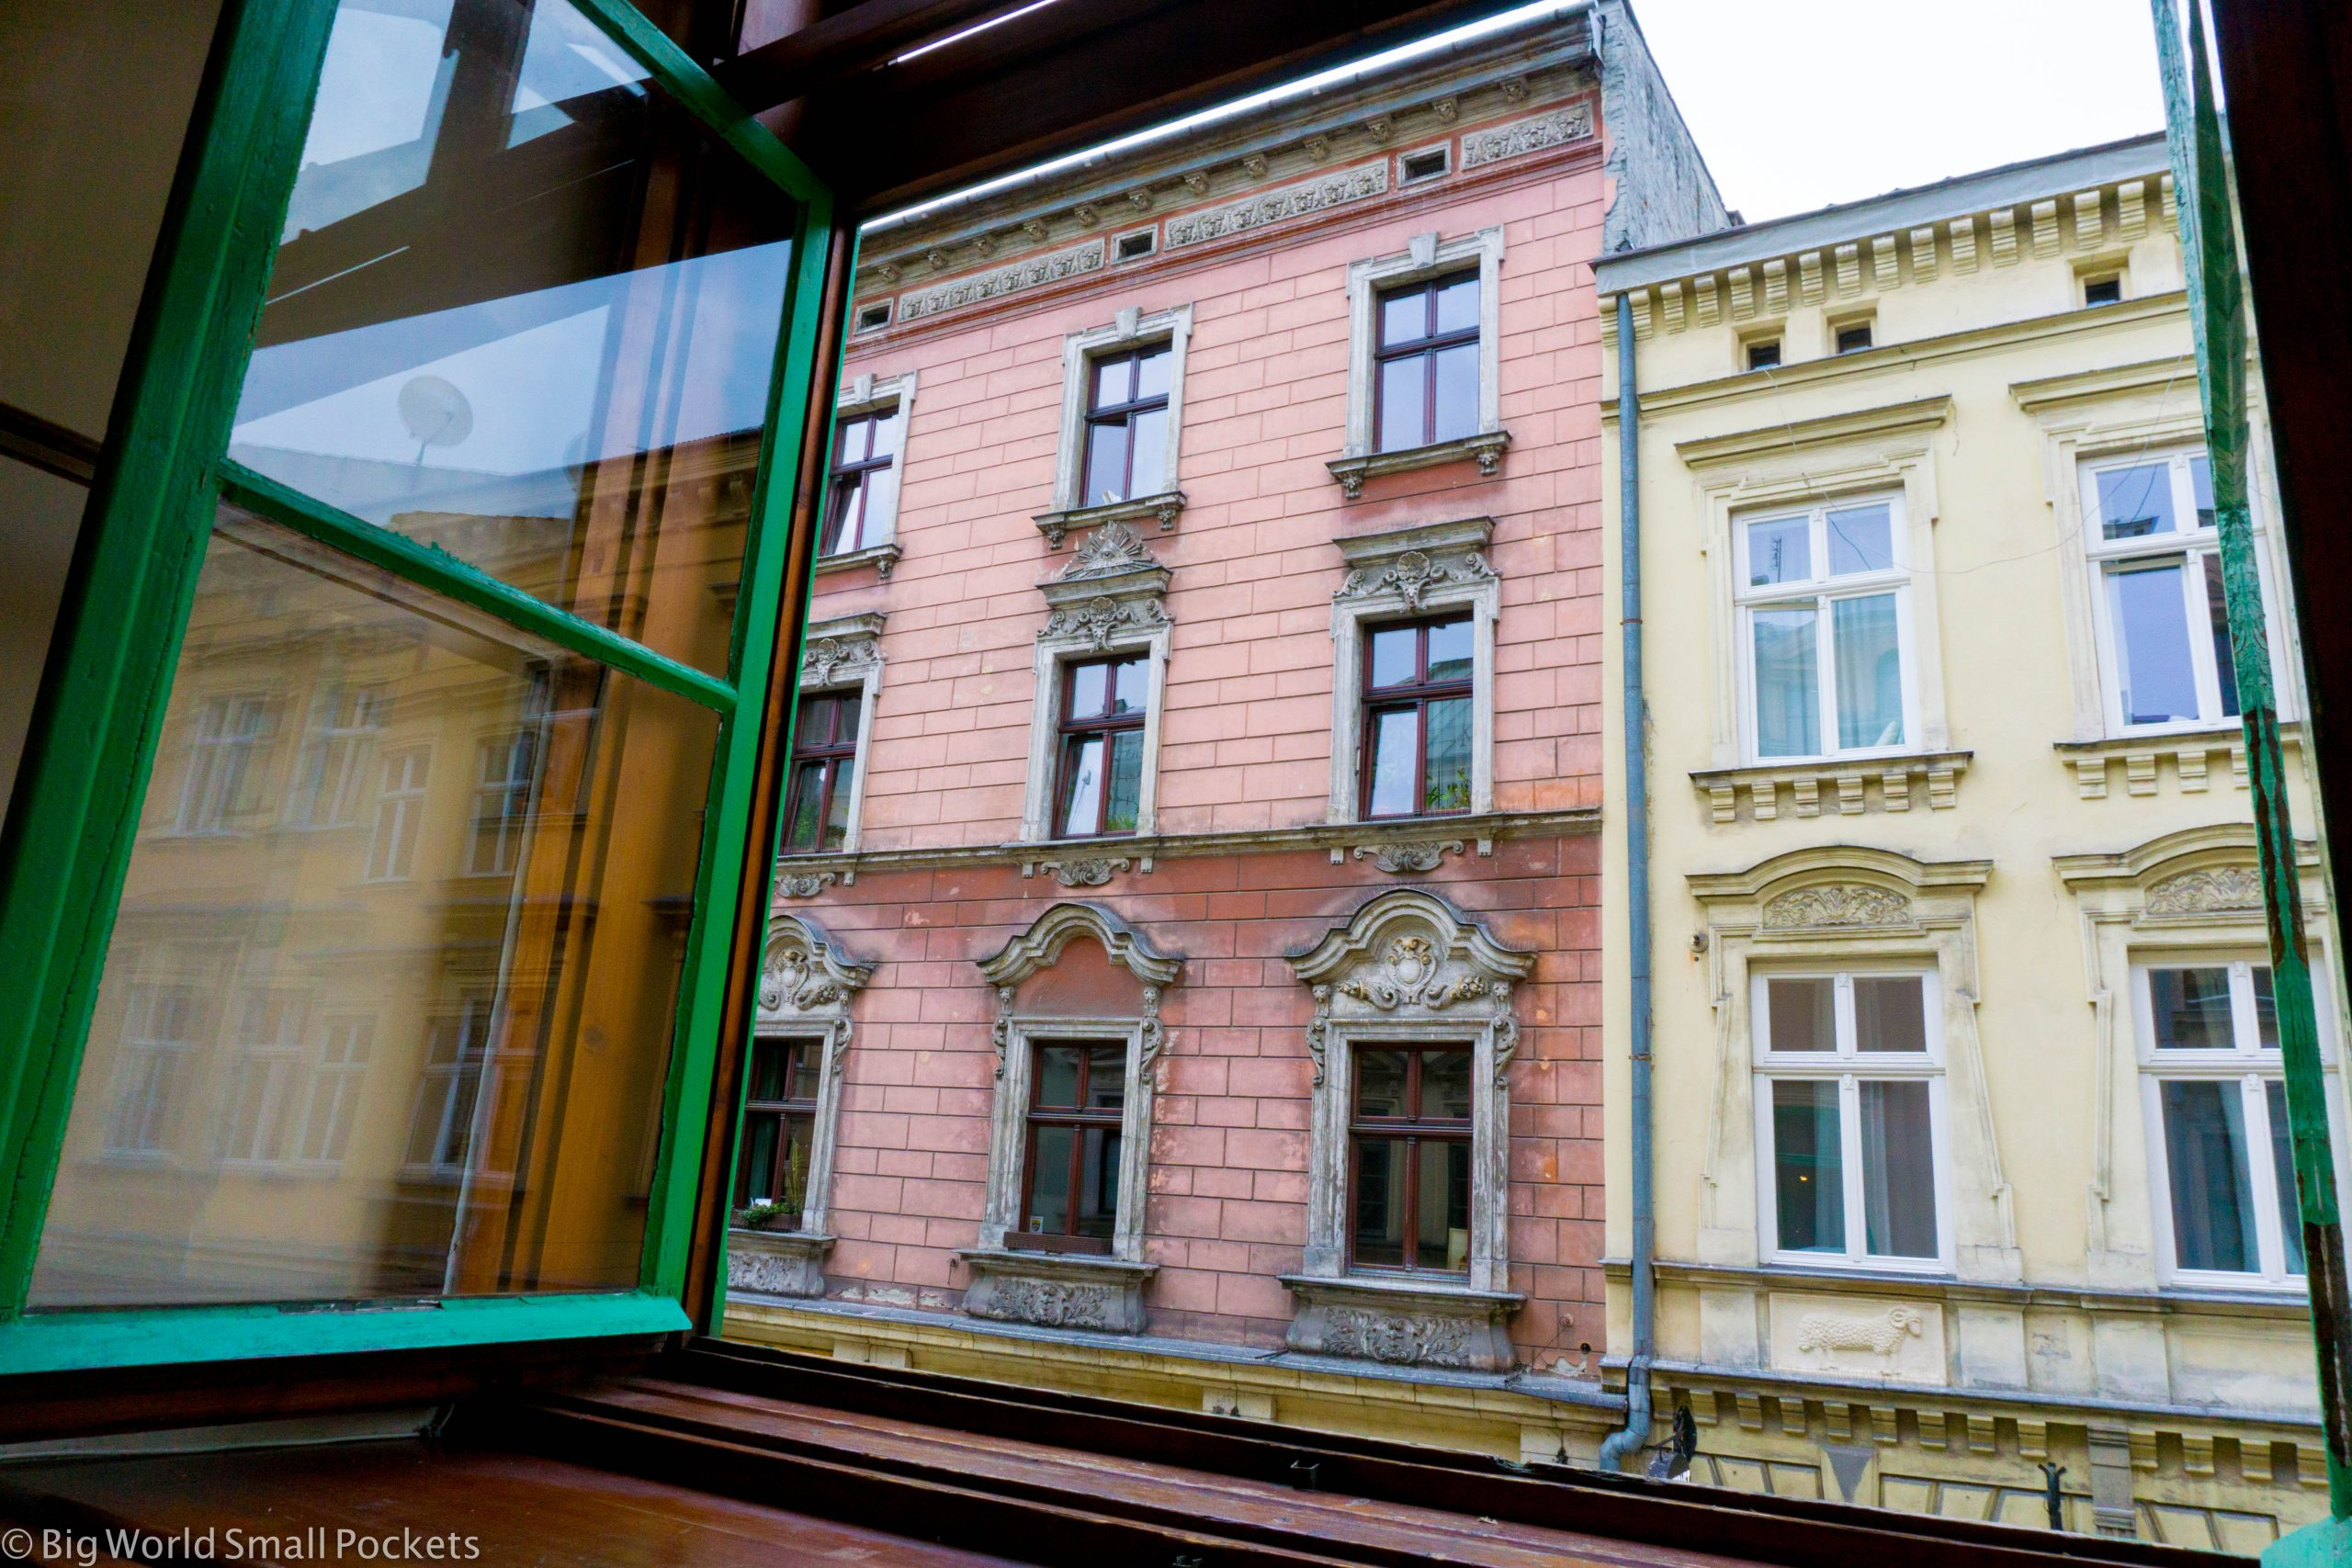 Poland, Krakow, Window View